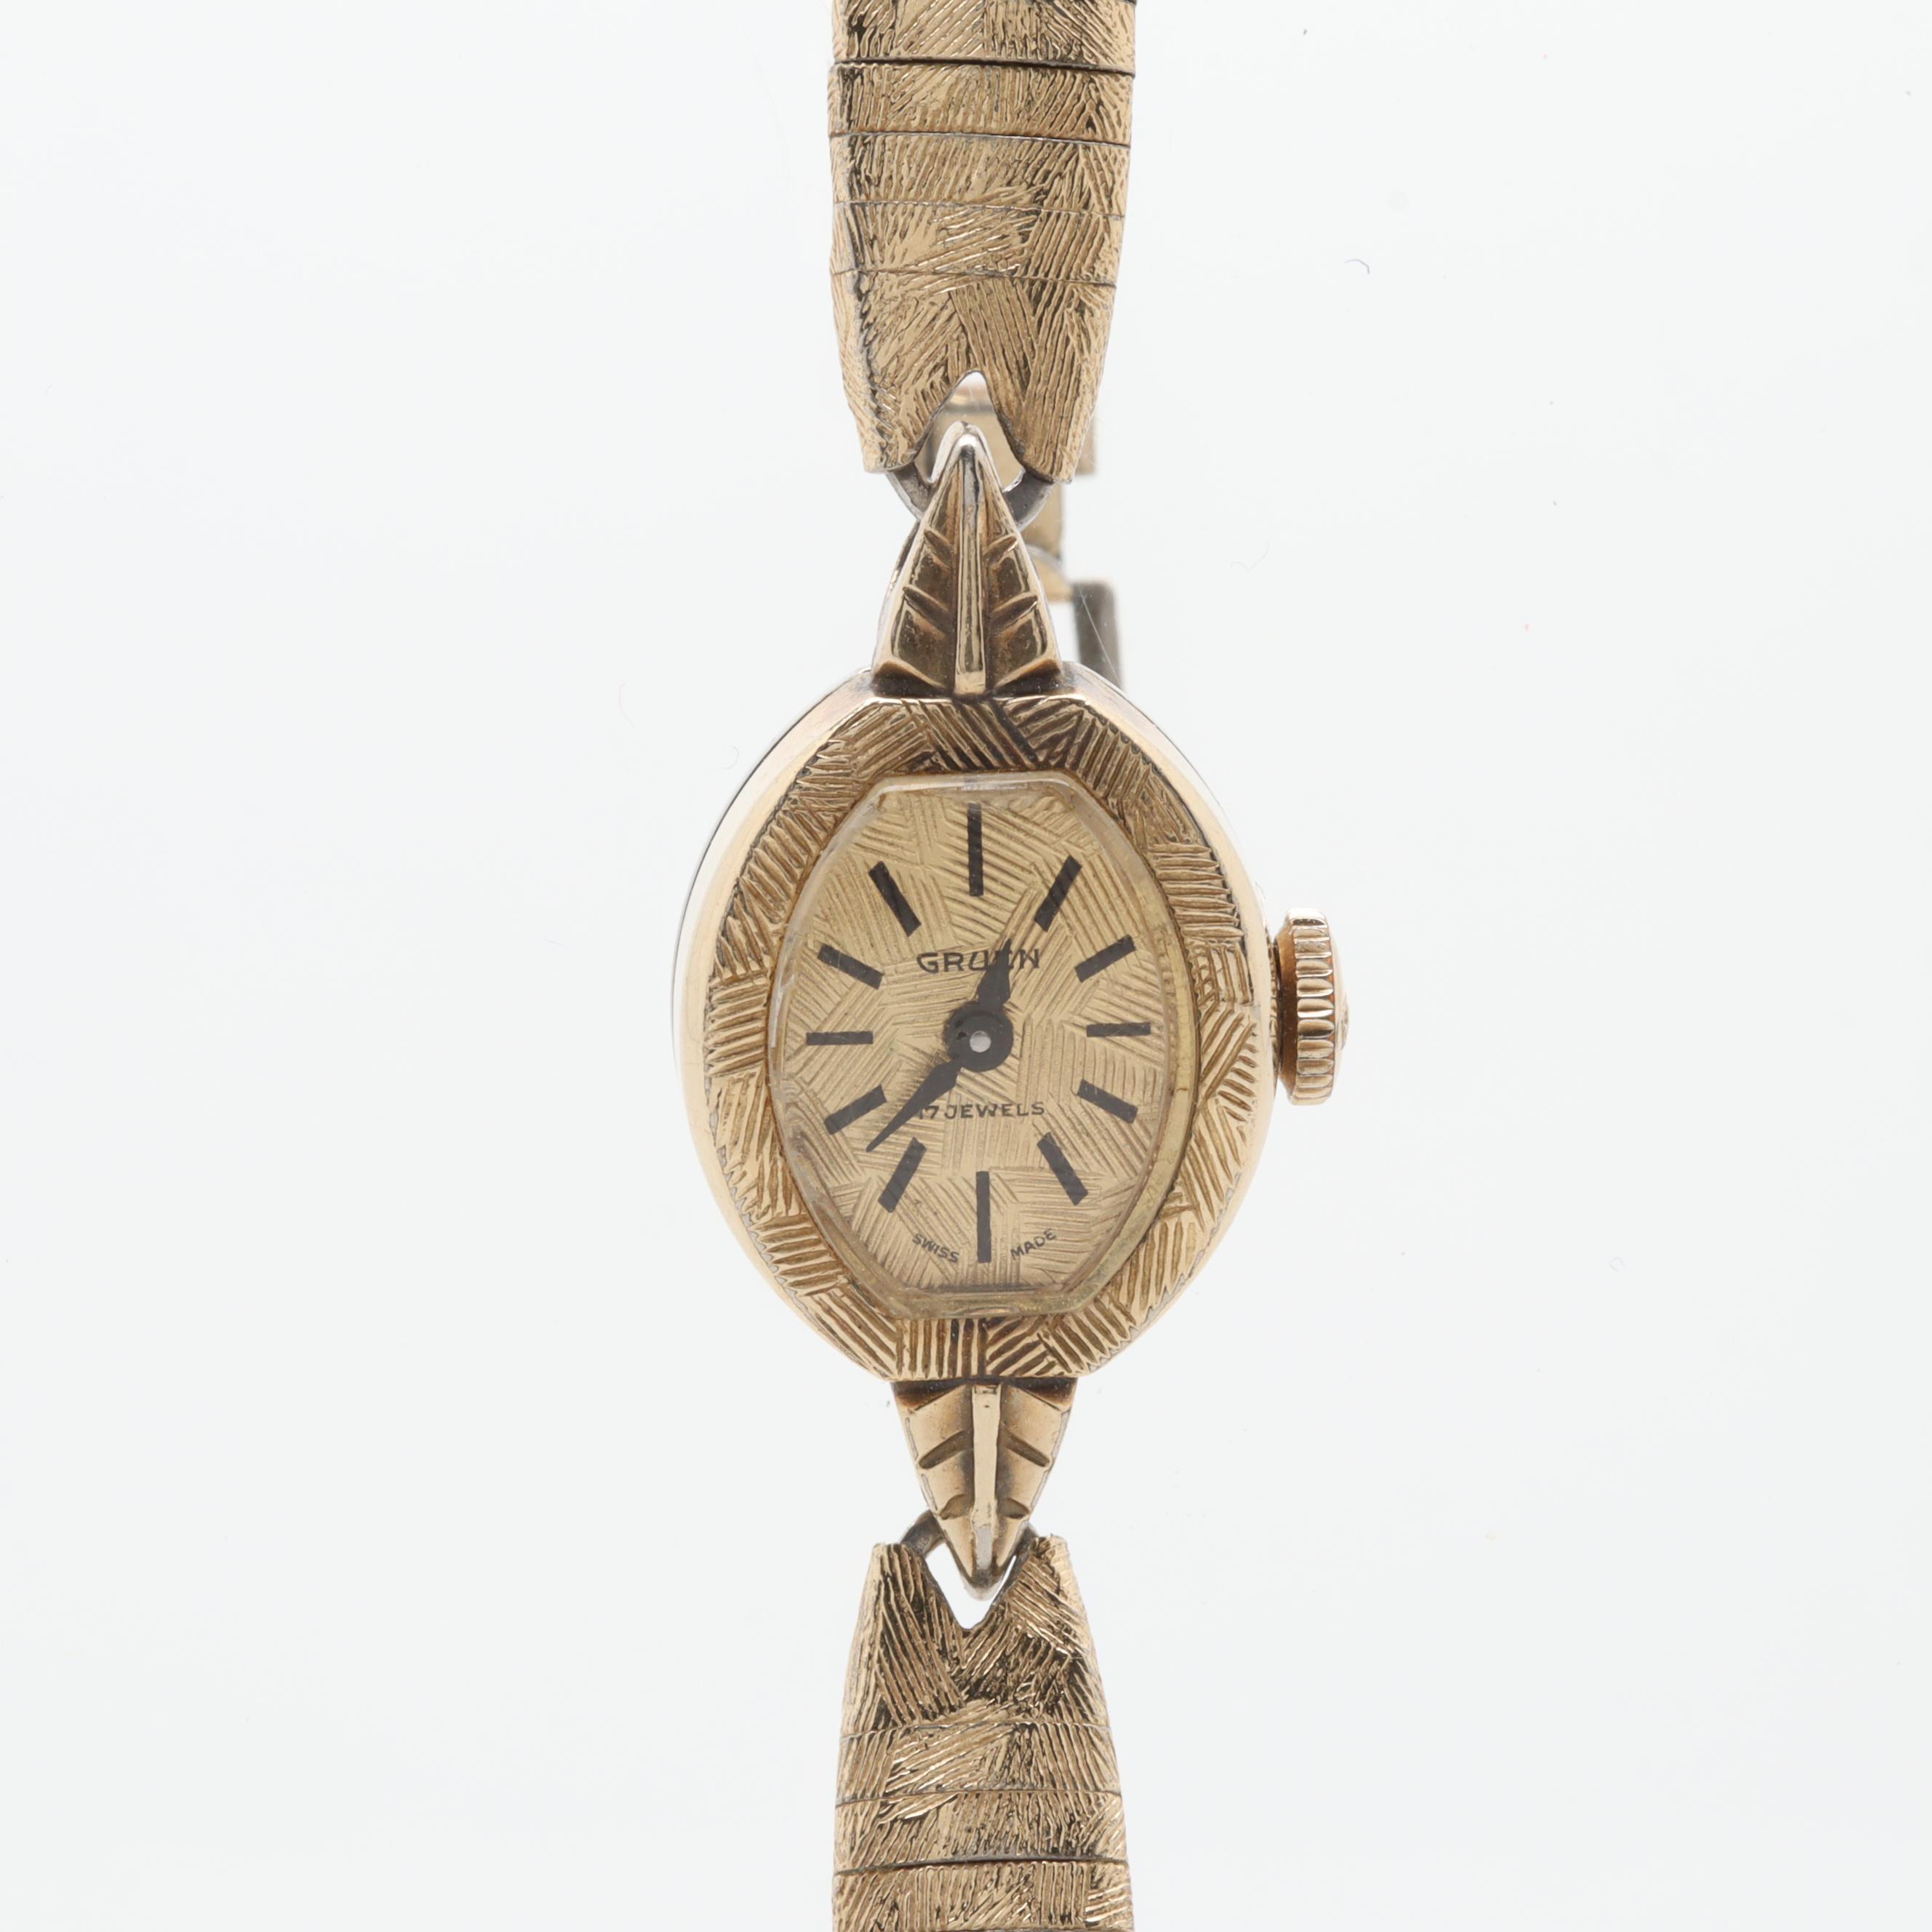 Gruen 489A 10K Gold Plated Stem Wind Wristwatch